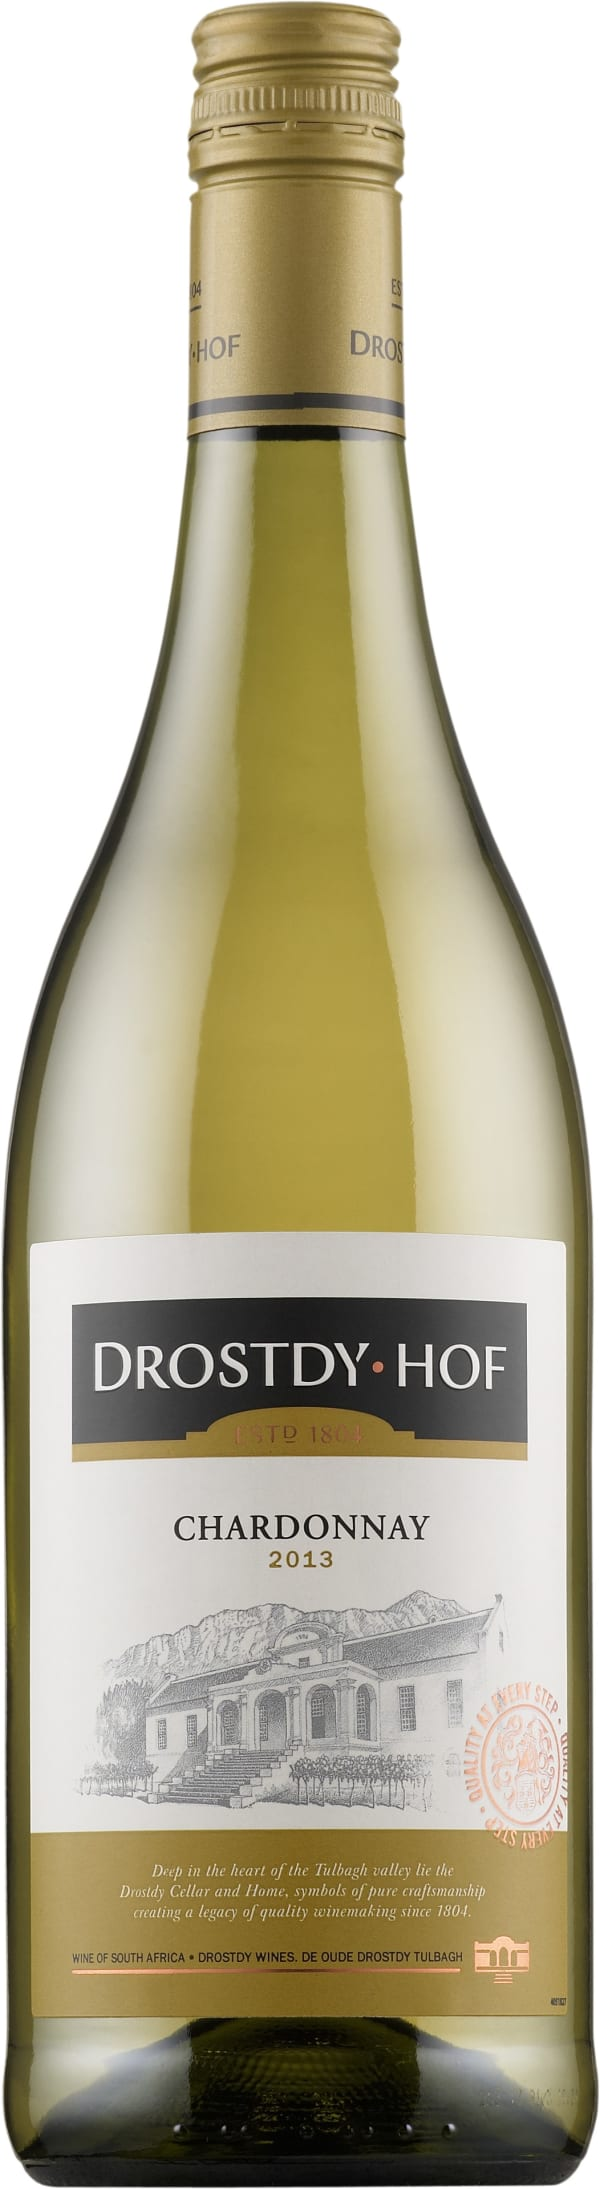 Drostdy-Hof Chardonnay 2015